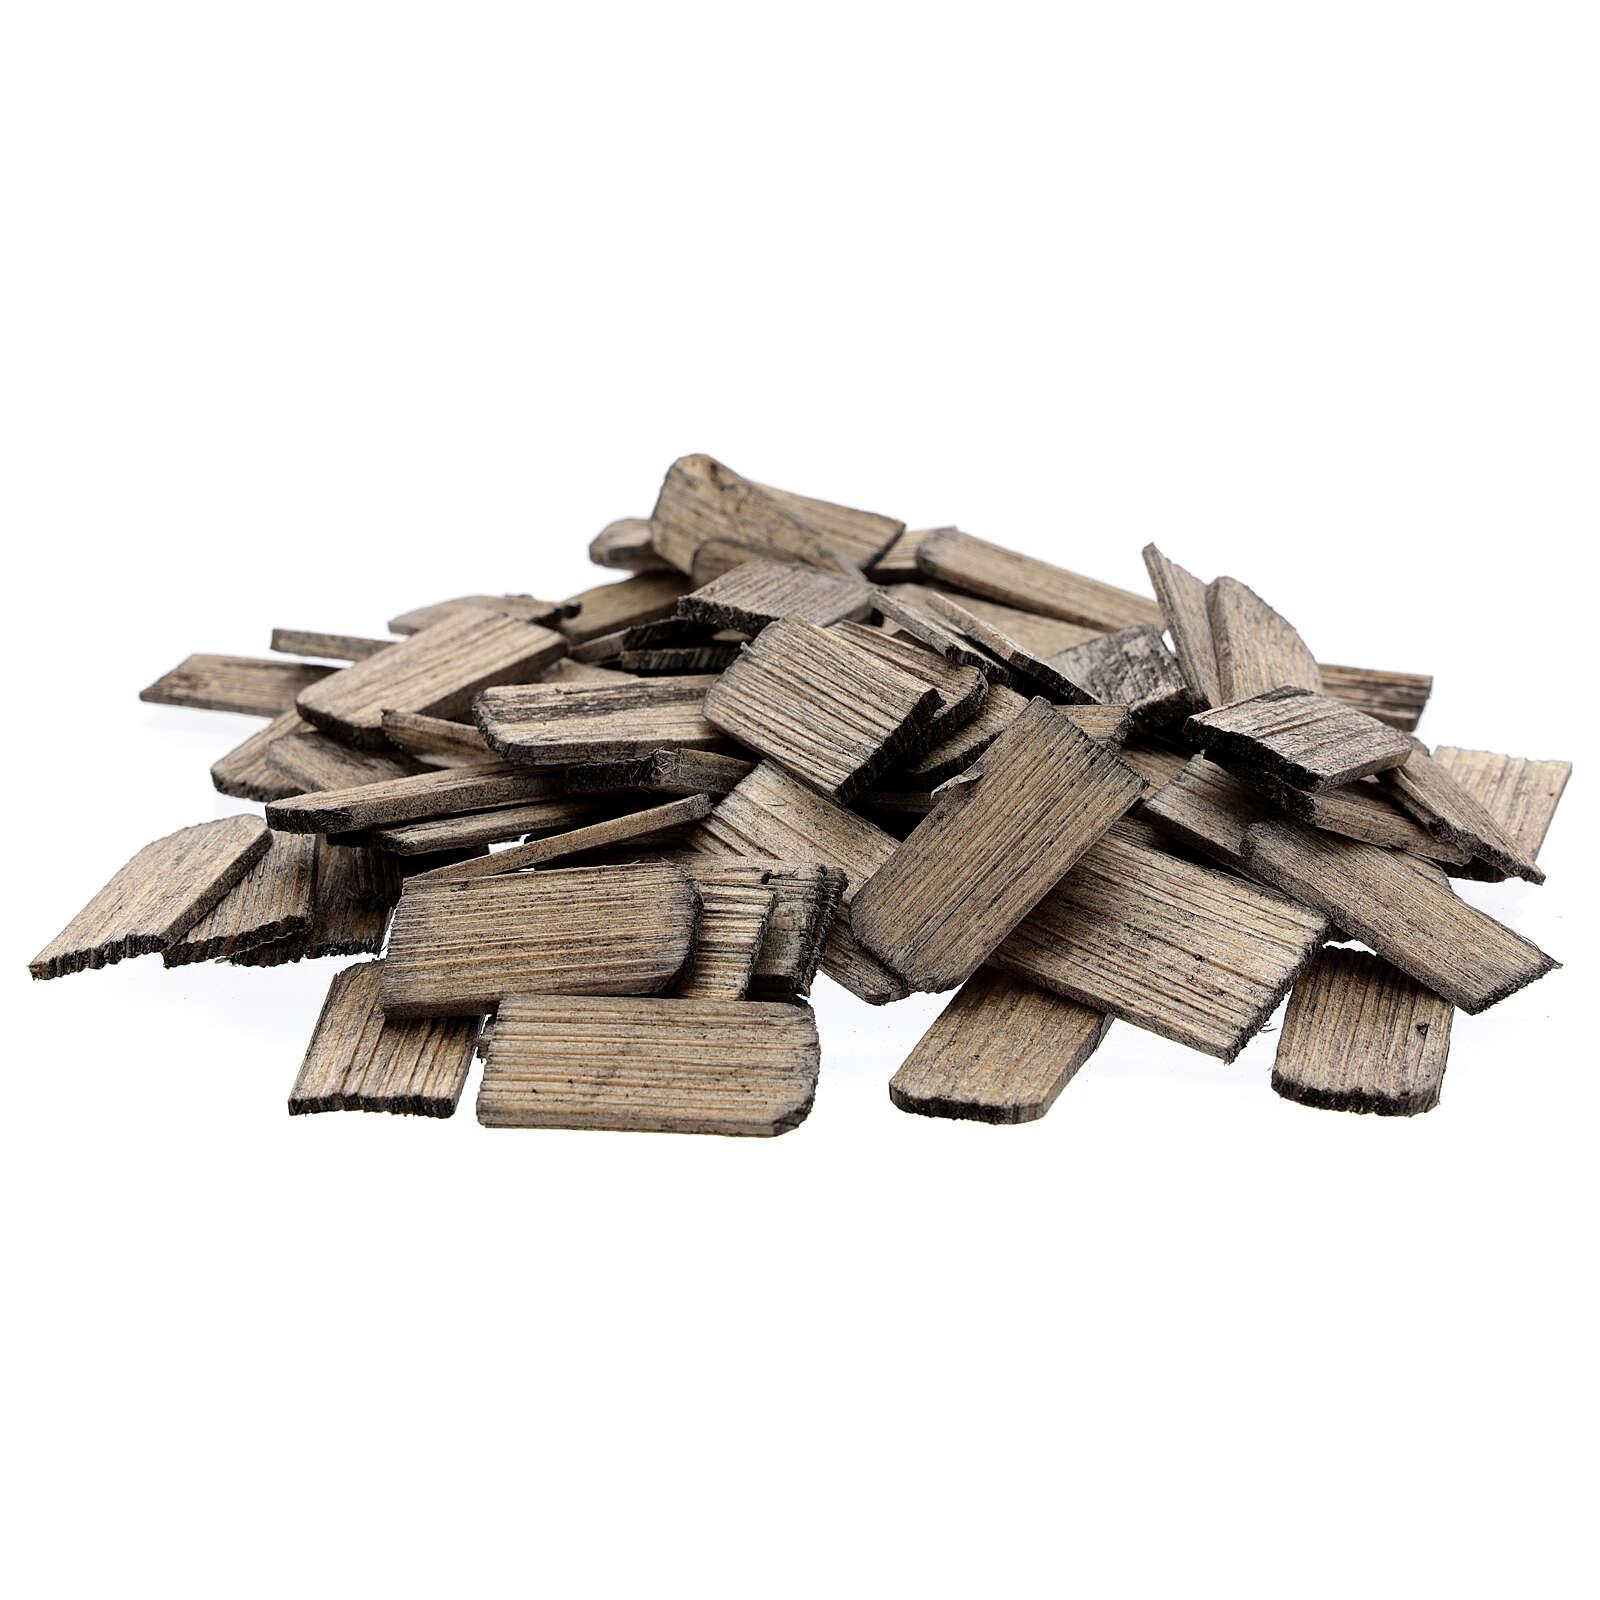 Scandole legno presepe 3x1,5 cm 100 pz 4